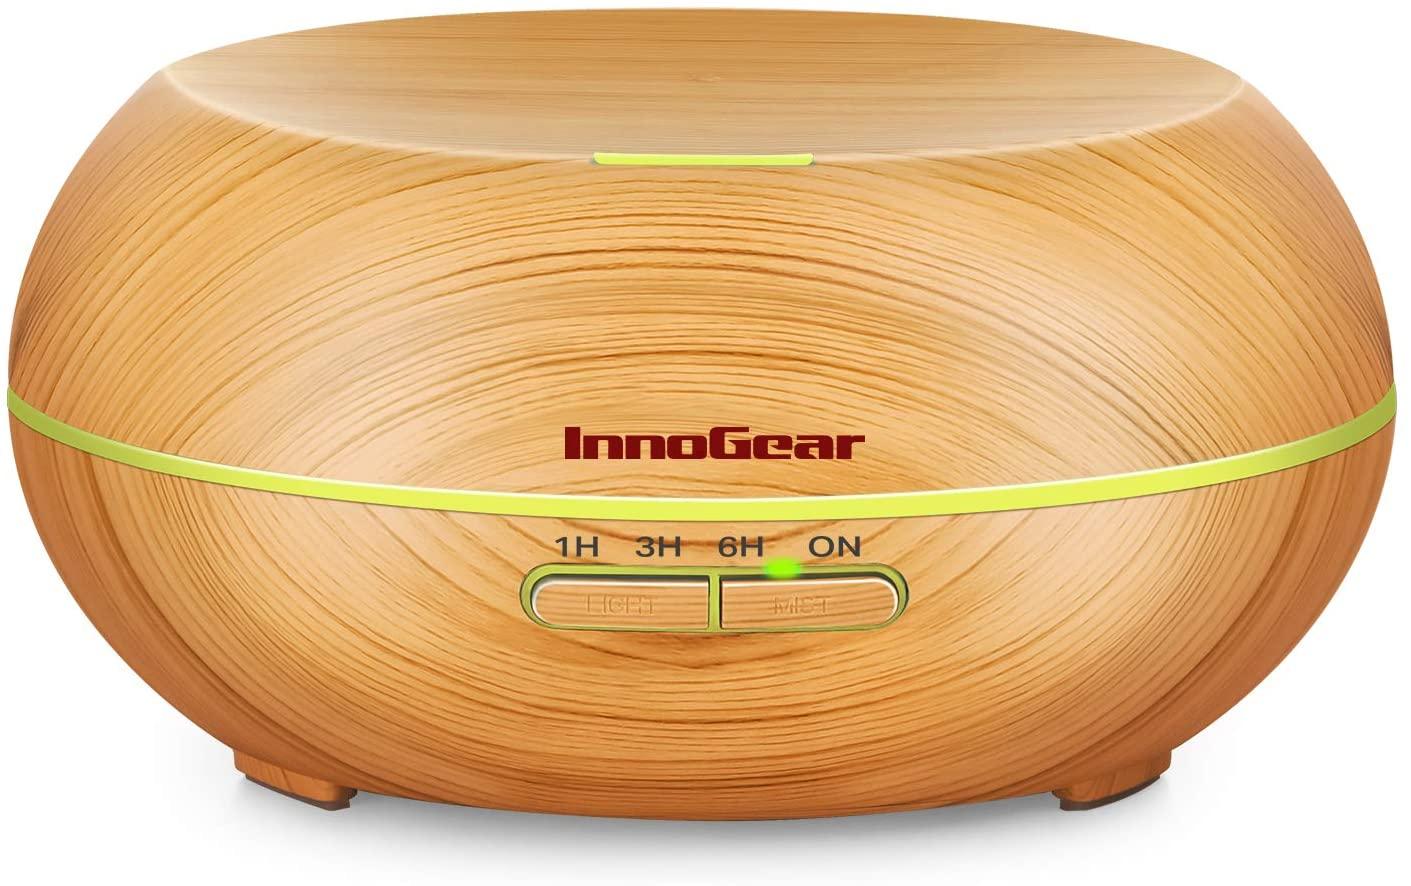 InnoGear Diffusers for Essential Oils, Wood Grain